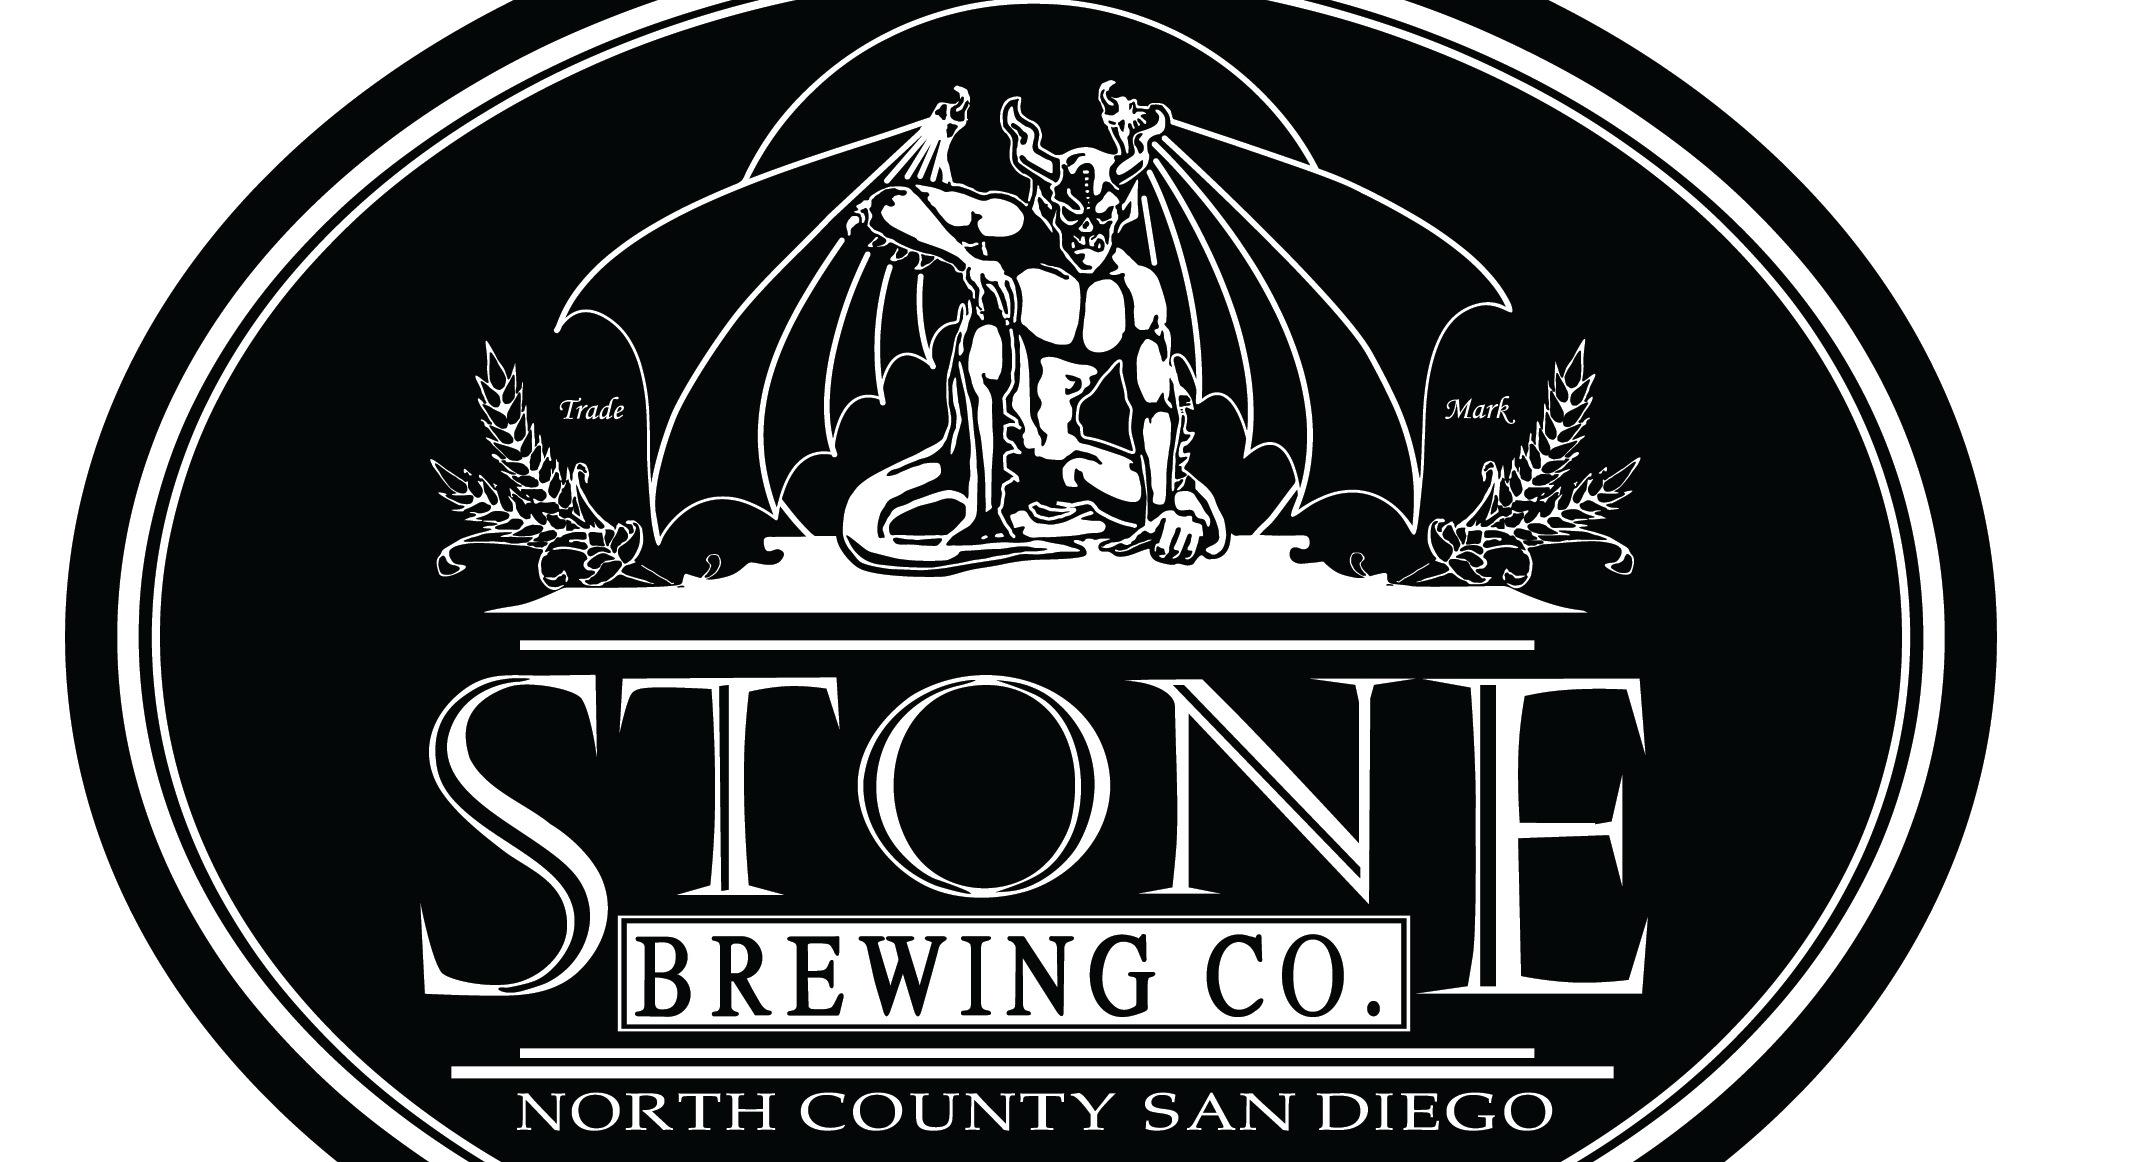 Stone Co